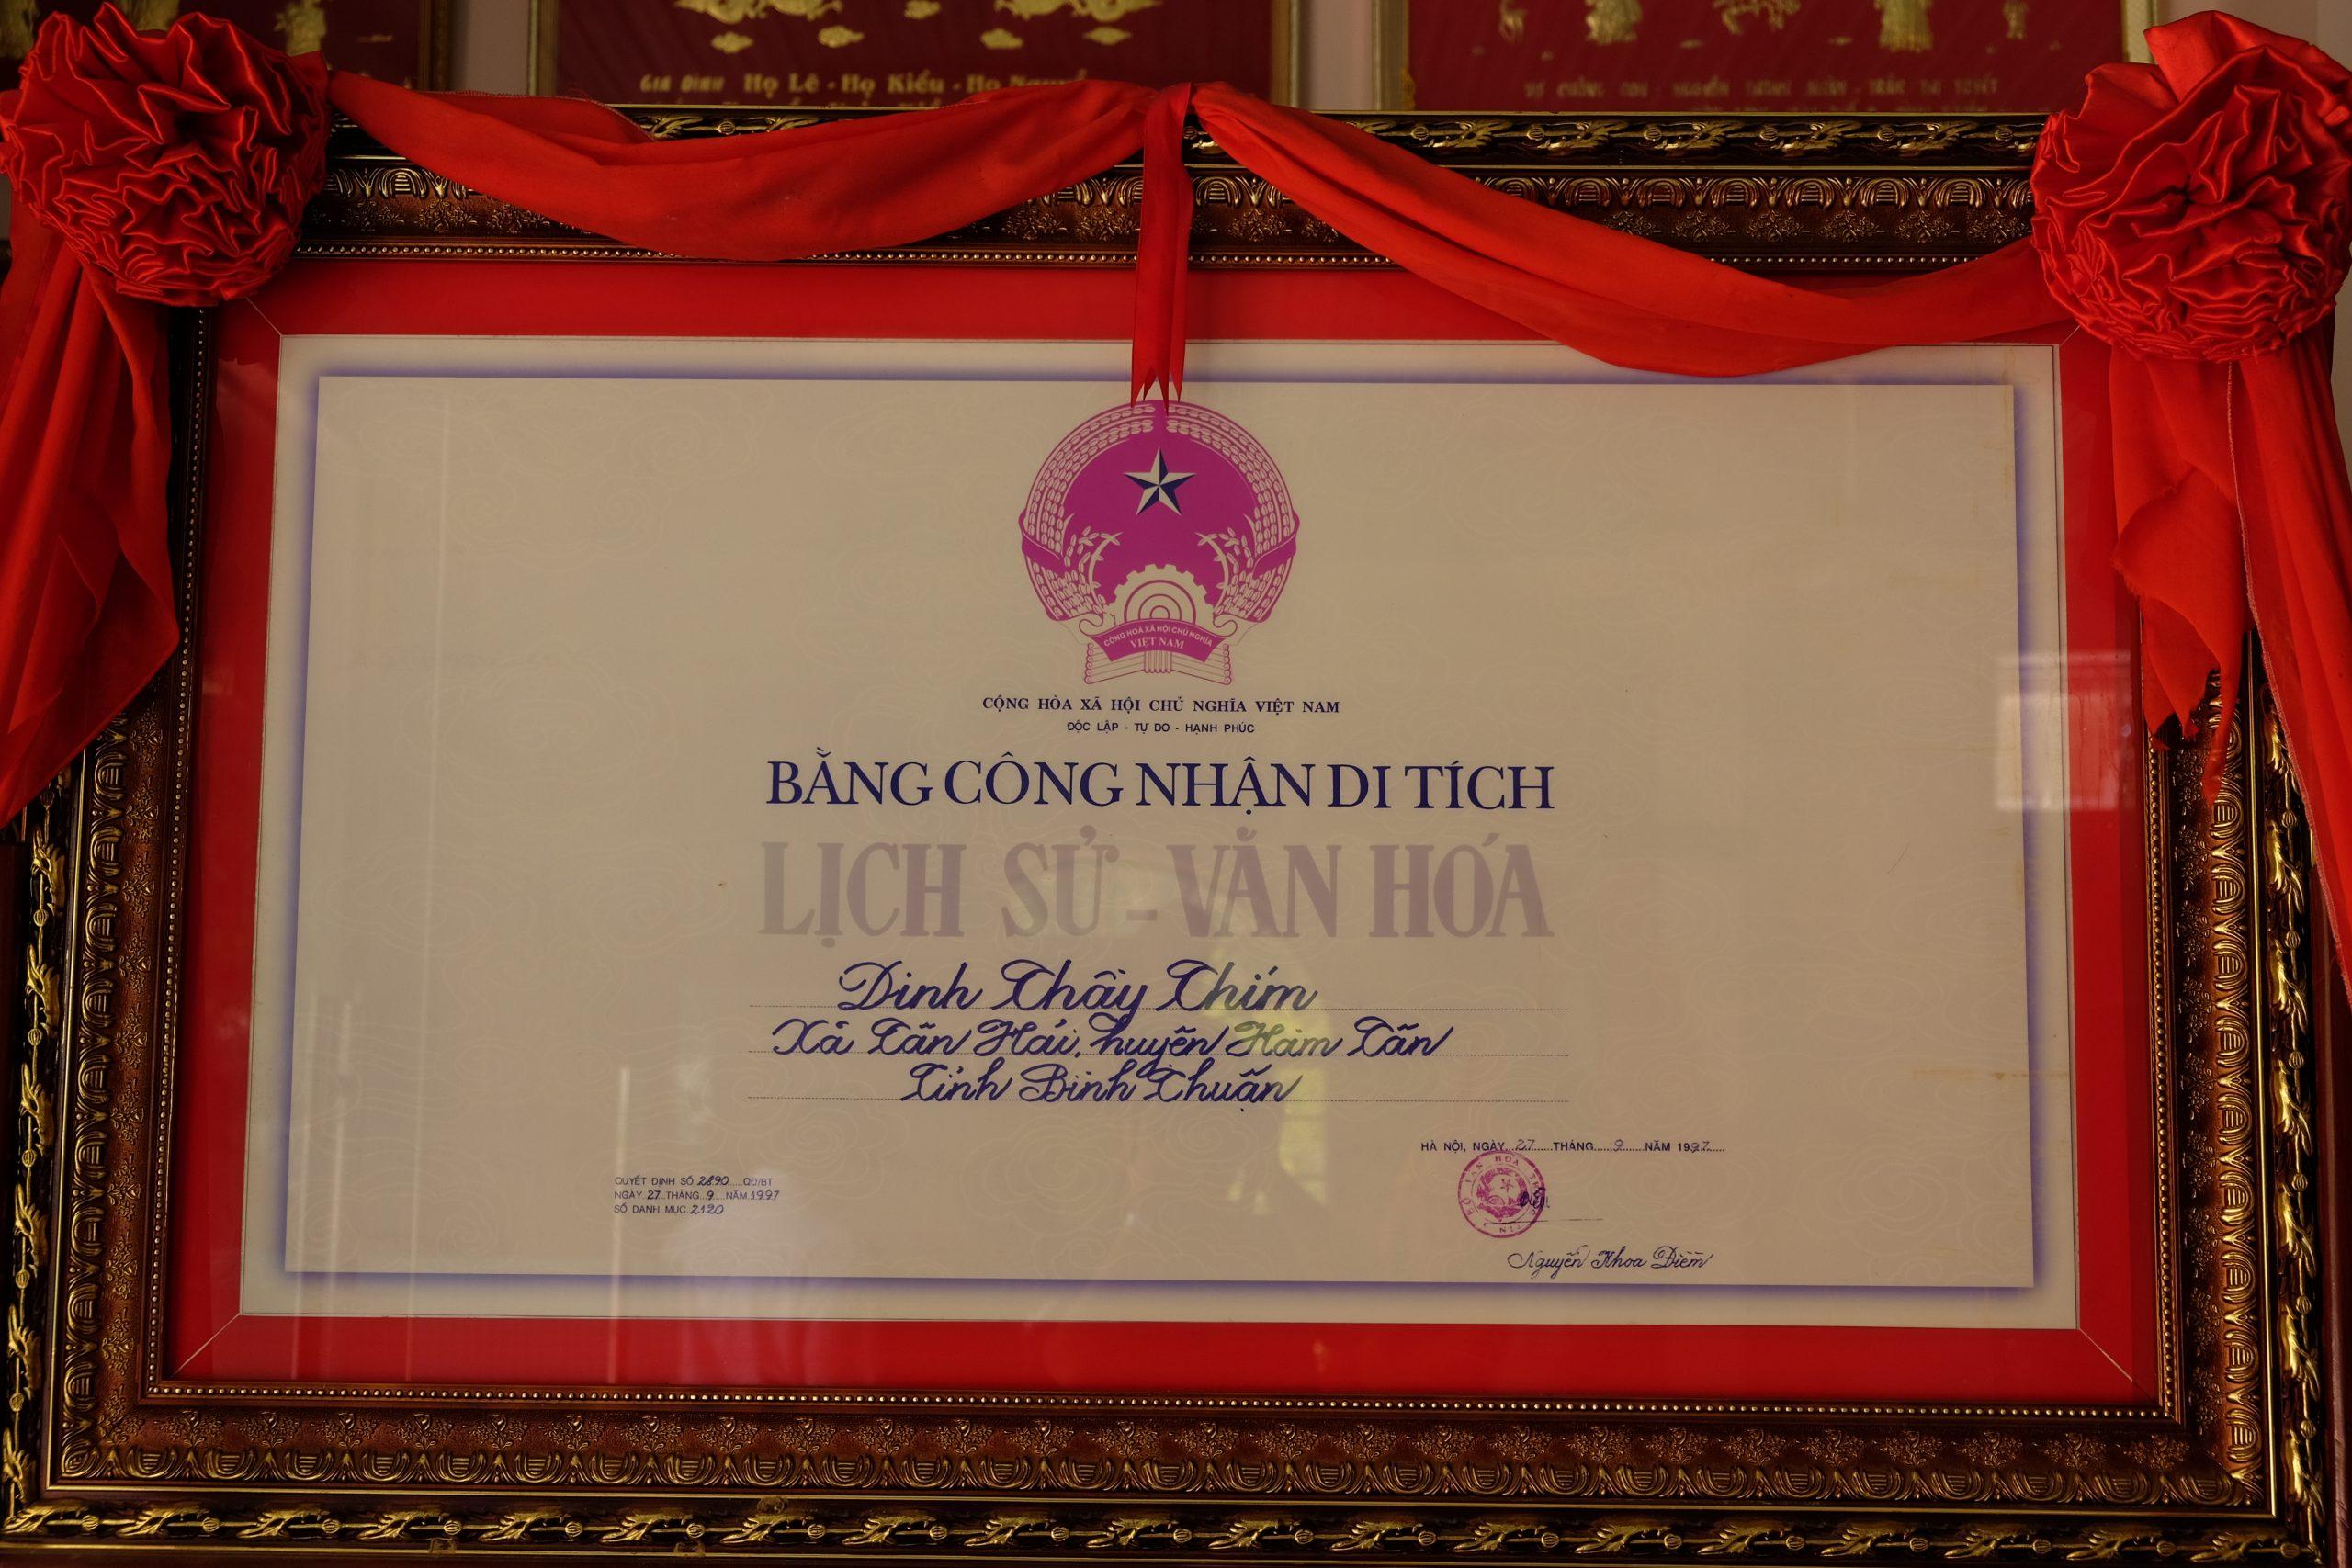 Le hoi dinh Thay Thim 2020 – 15